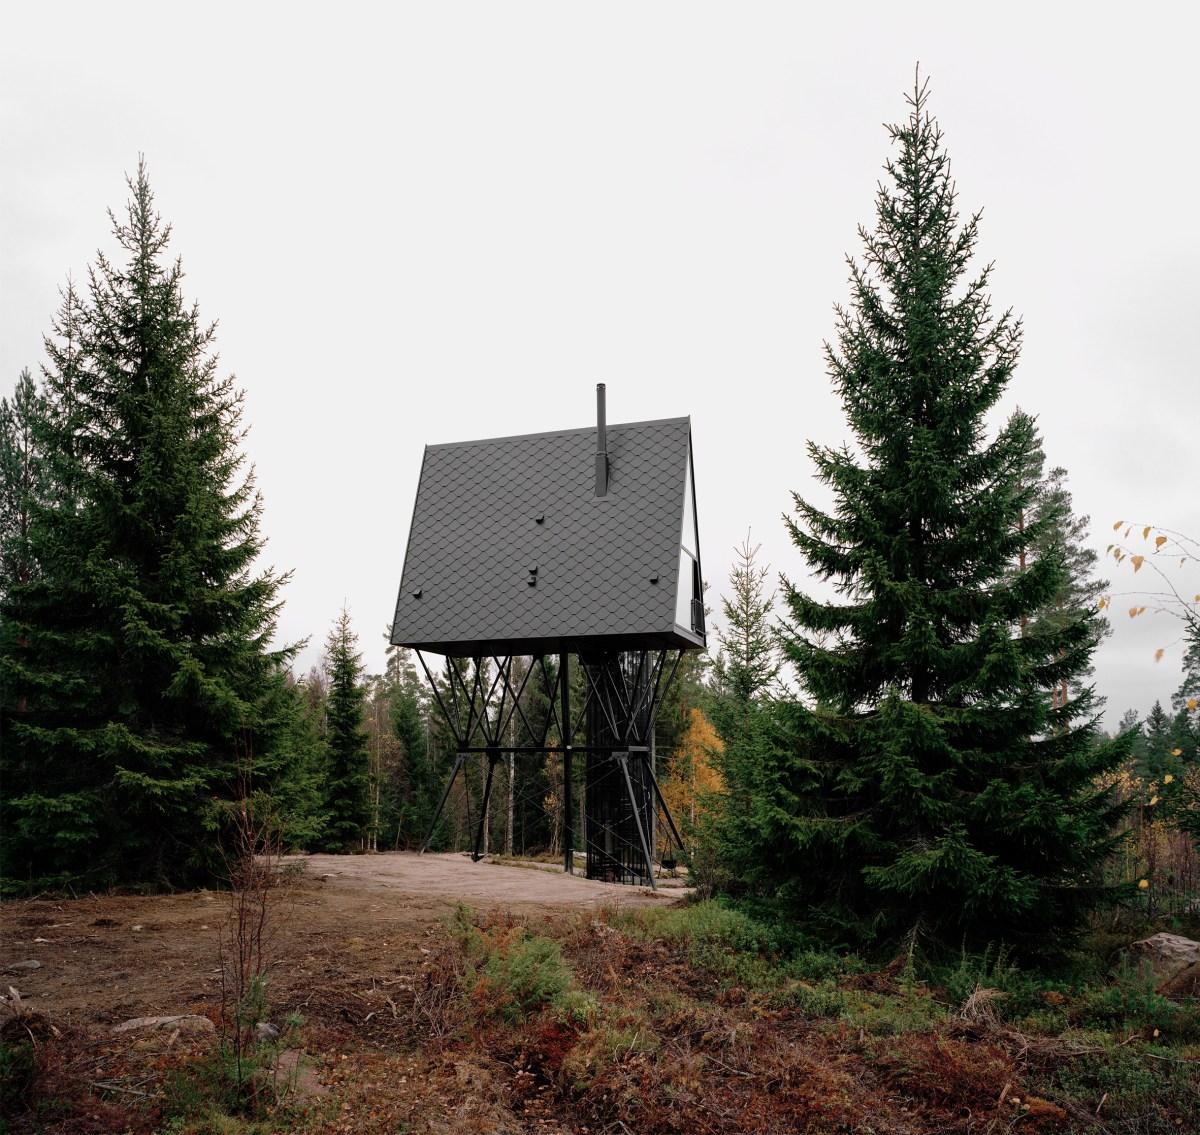 pan-treetop-cabins-espen-surnevik-woodland-architecture-norway-_dezeen_2364_col_2